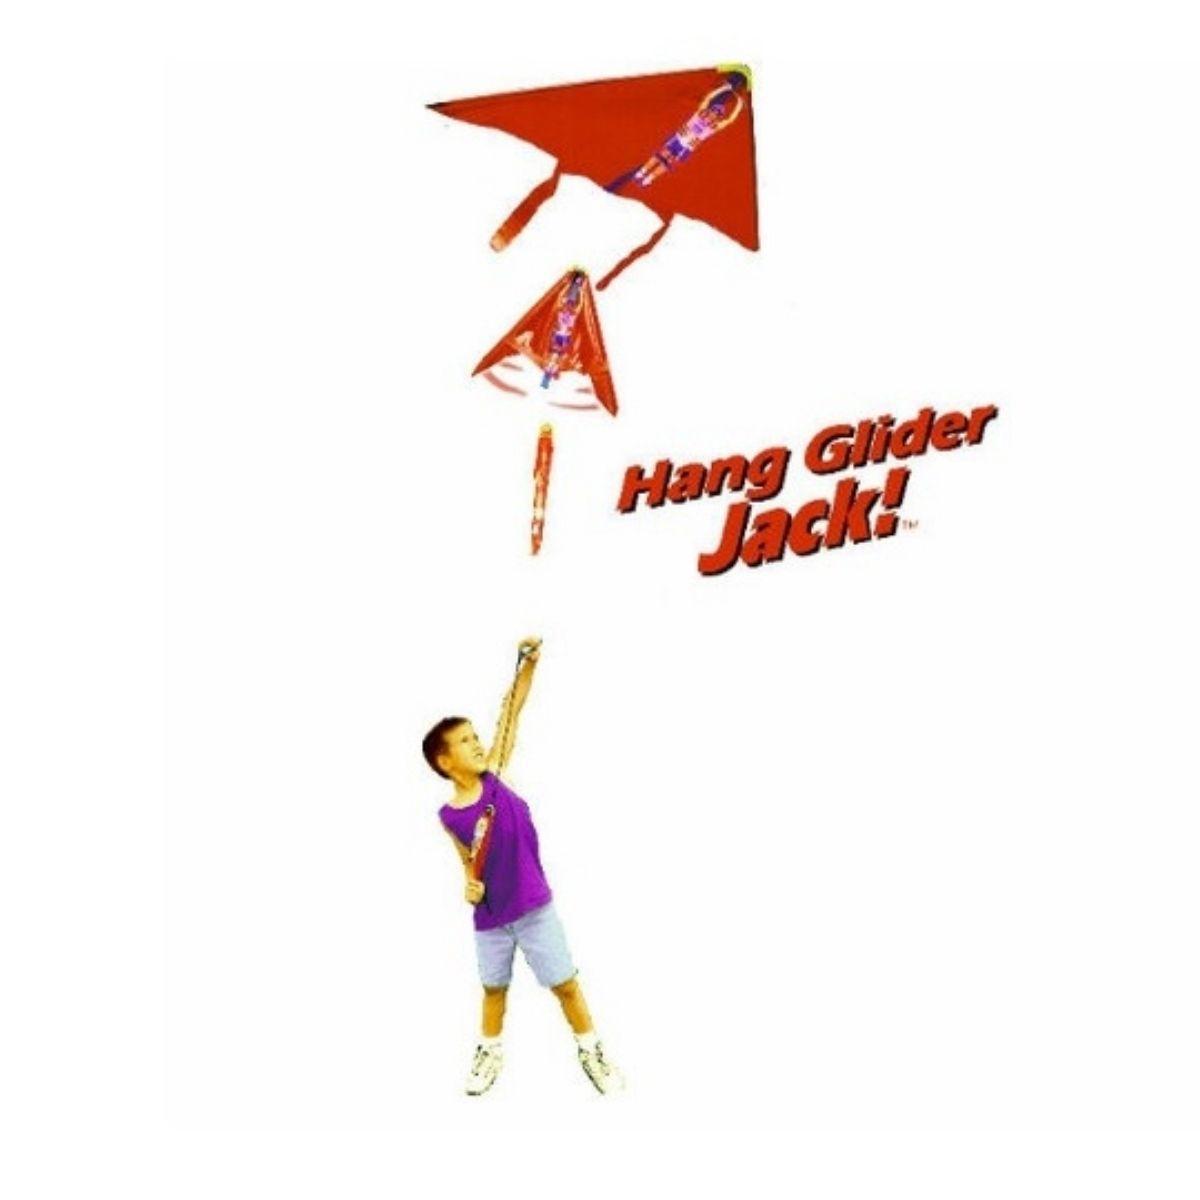 Brinquedo HANG GLIDER JACK